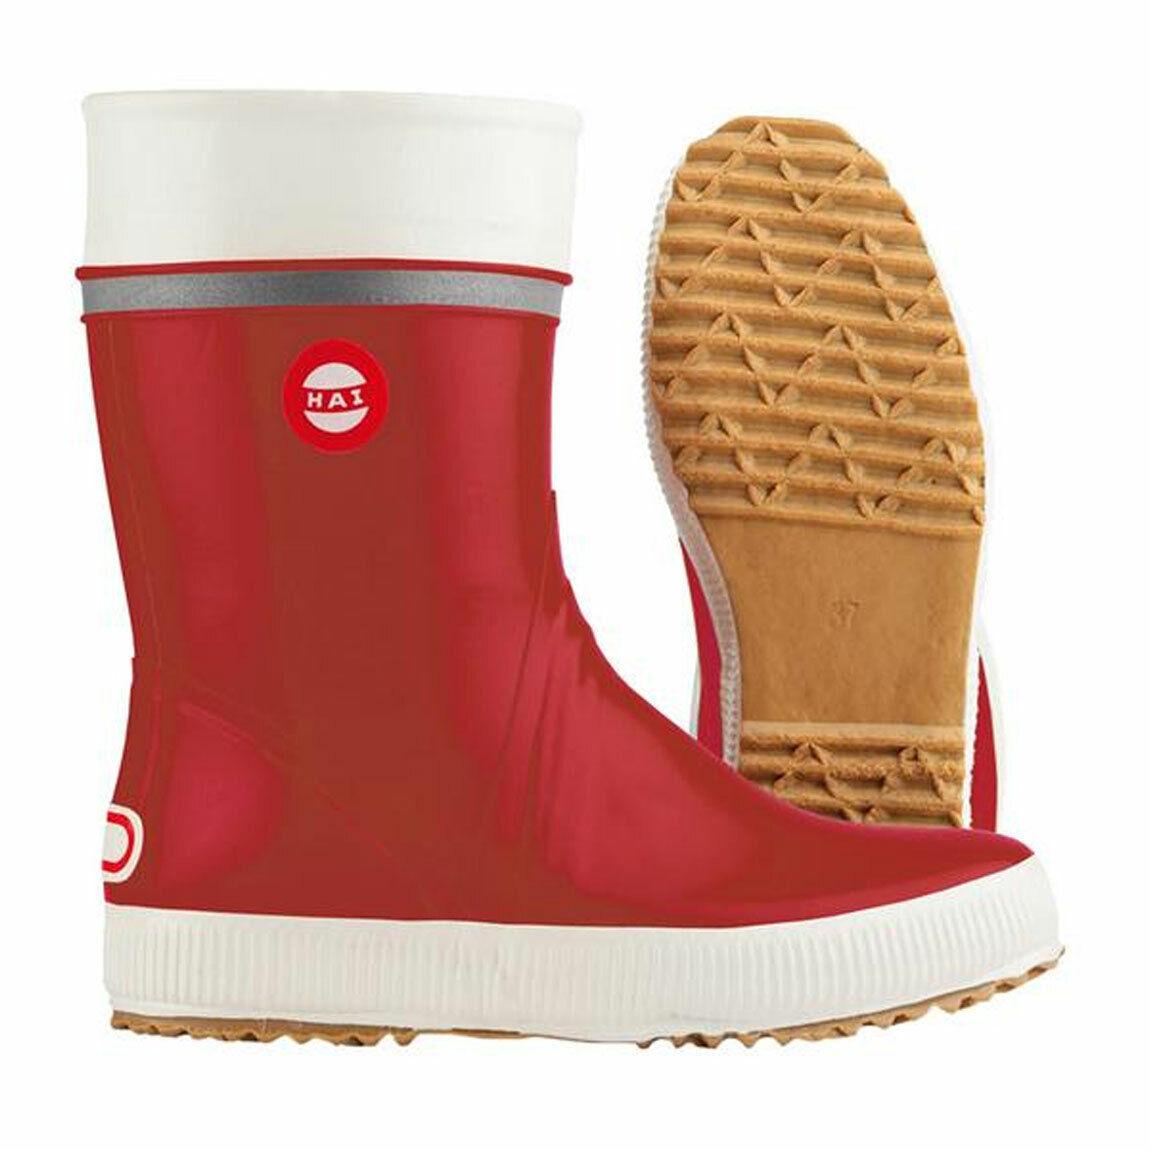 Nokian Hai  Wellington Boots - Unisex Wellies  discount